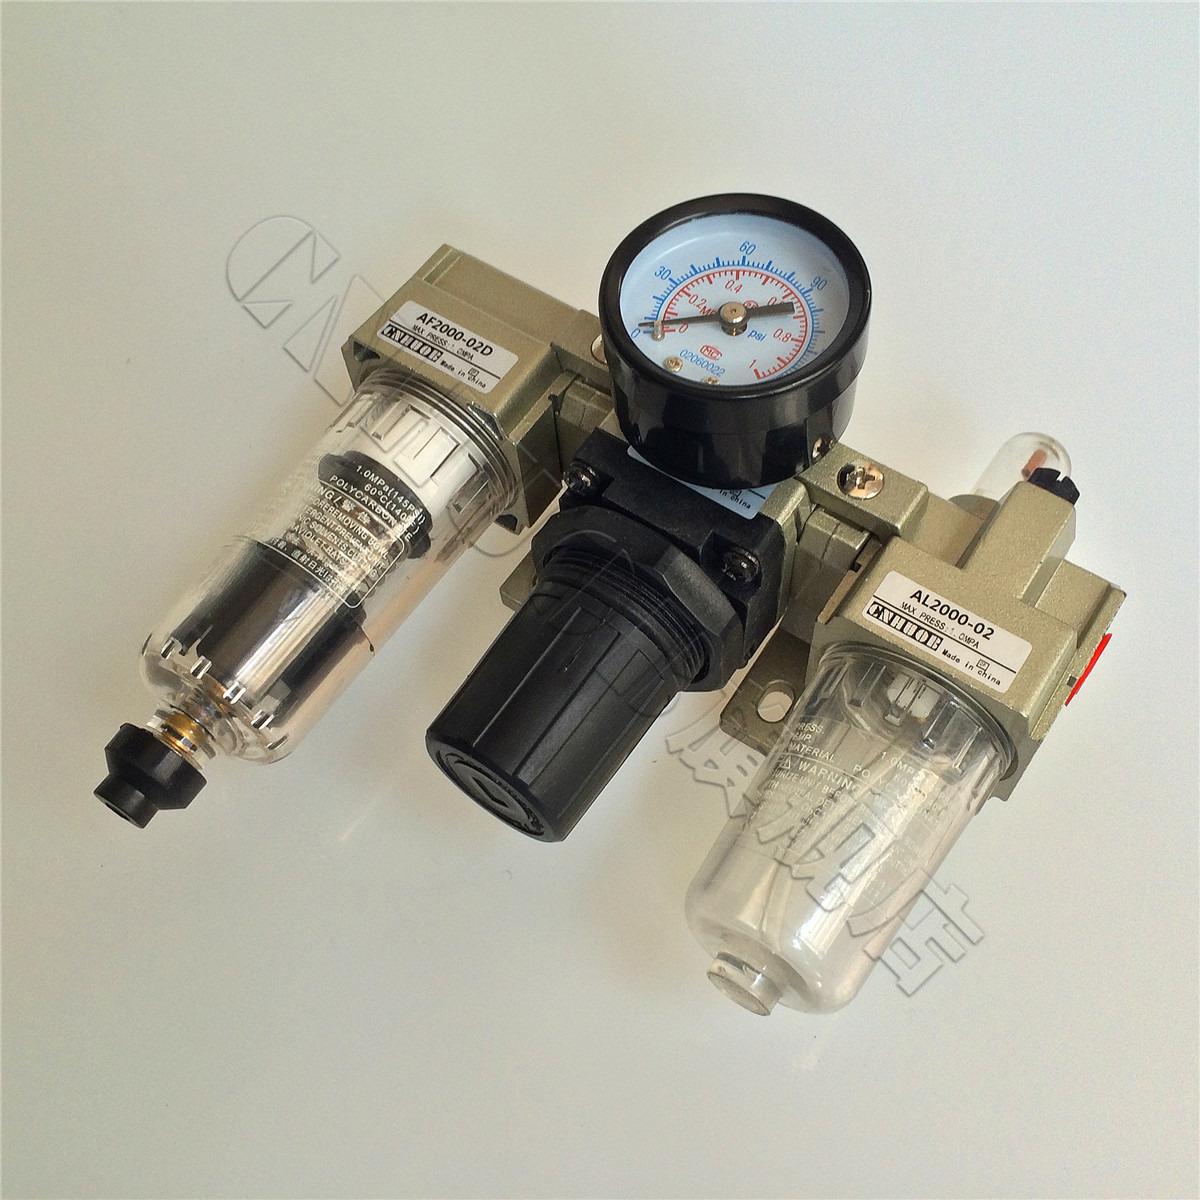 Ckd air filter regulator local air cooler